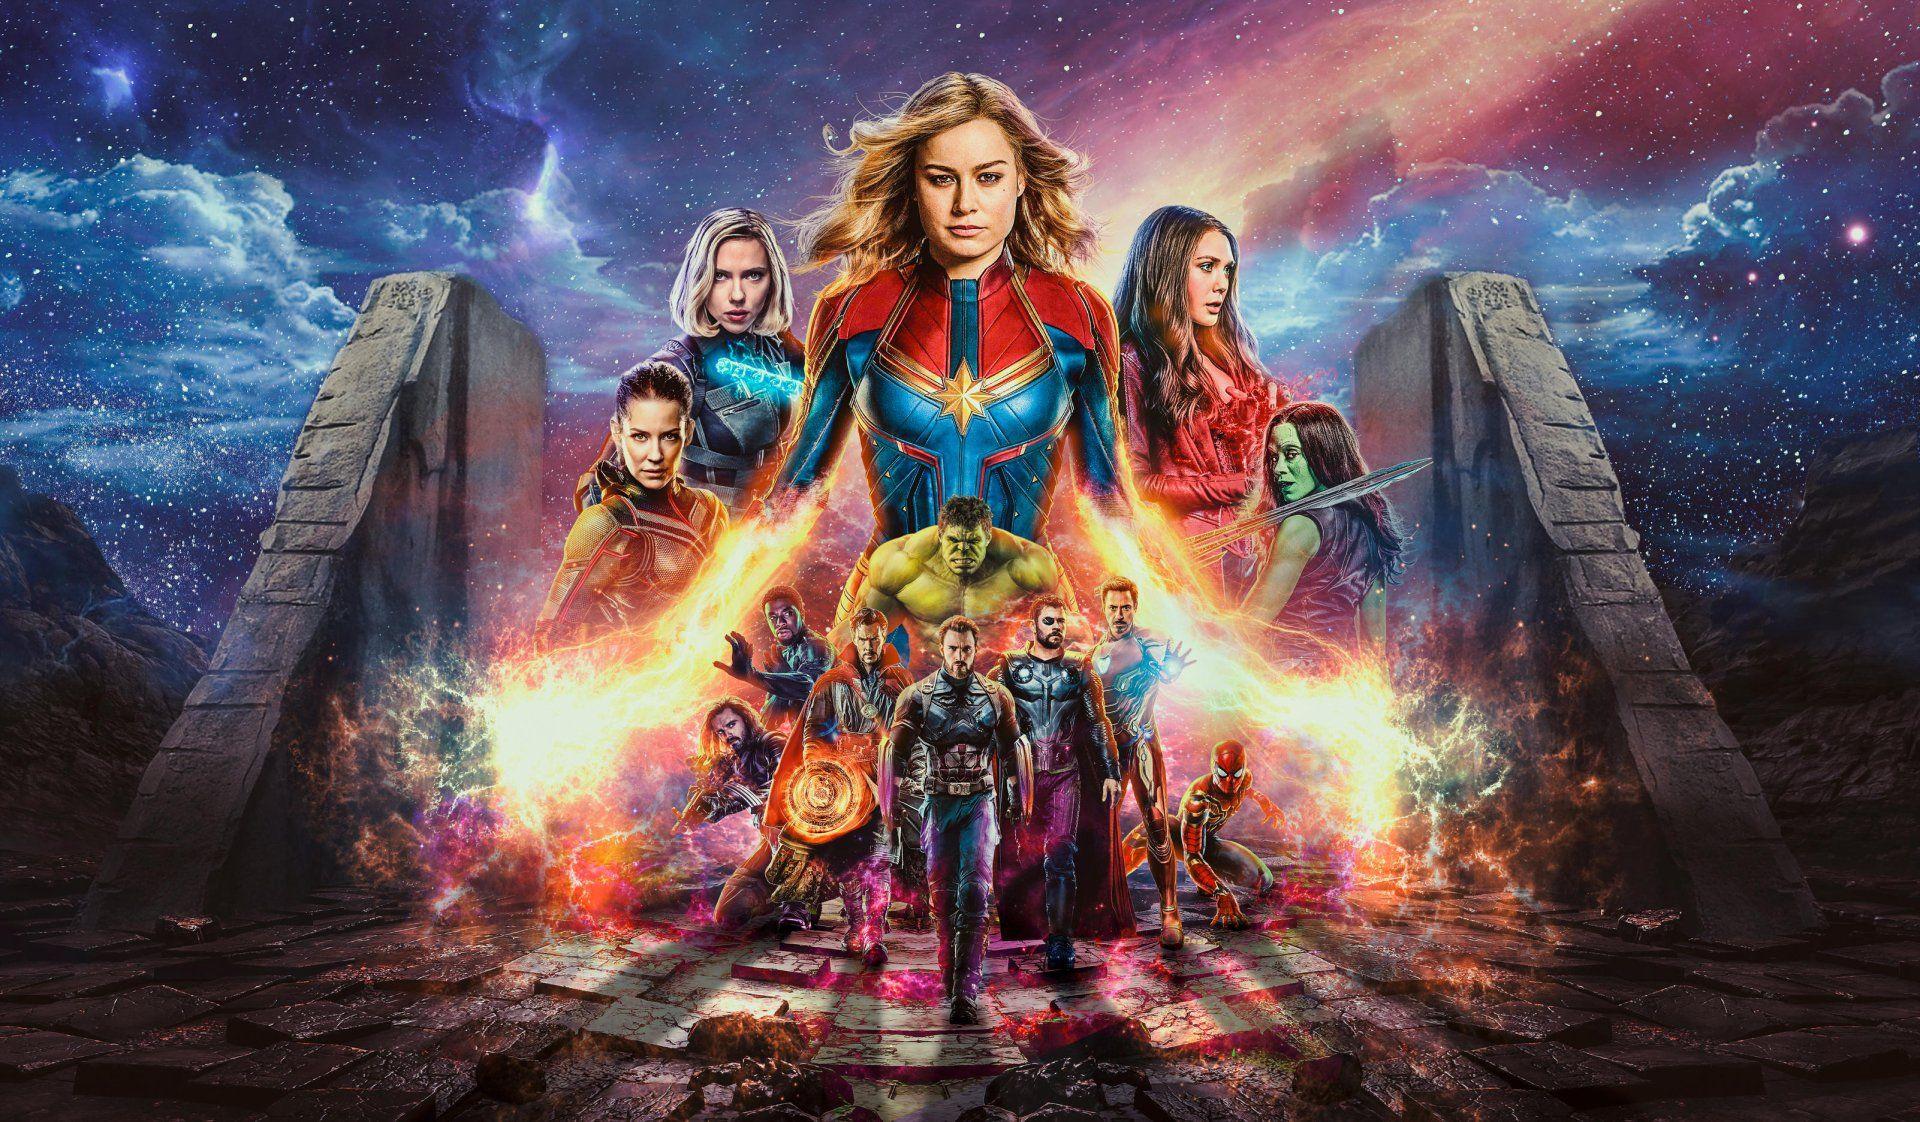 Wallpaper Avengers Infinity War Marvel Movie 2018 3840x2160 Uhd